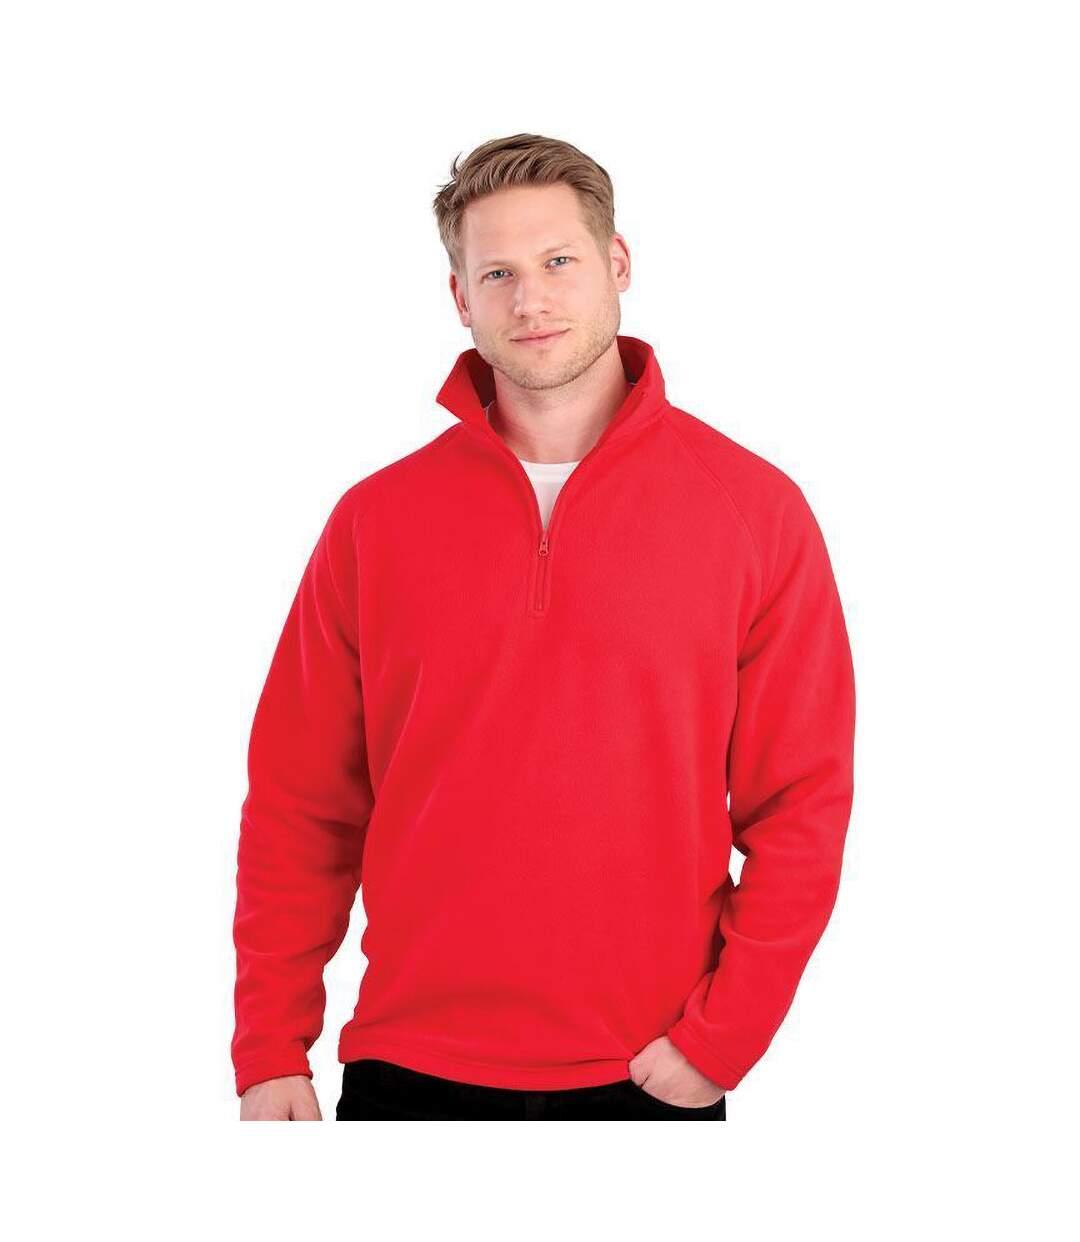 Result Core Micron - Haut polaire - Homme (Rouge) - UTBC849